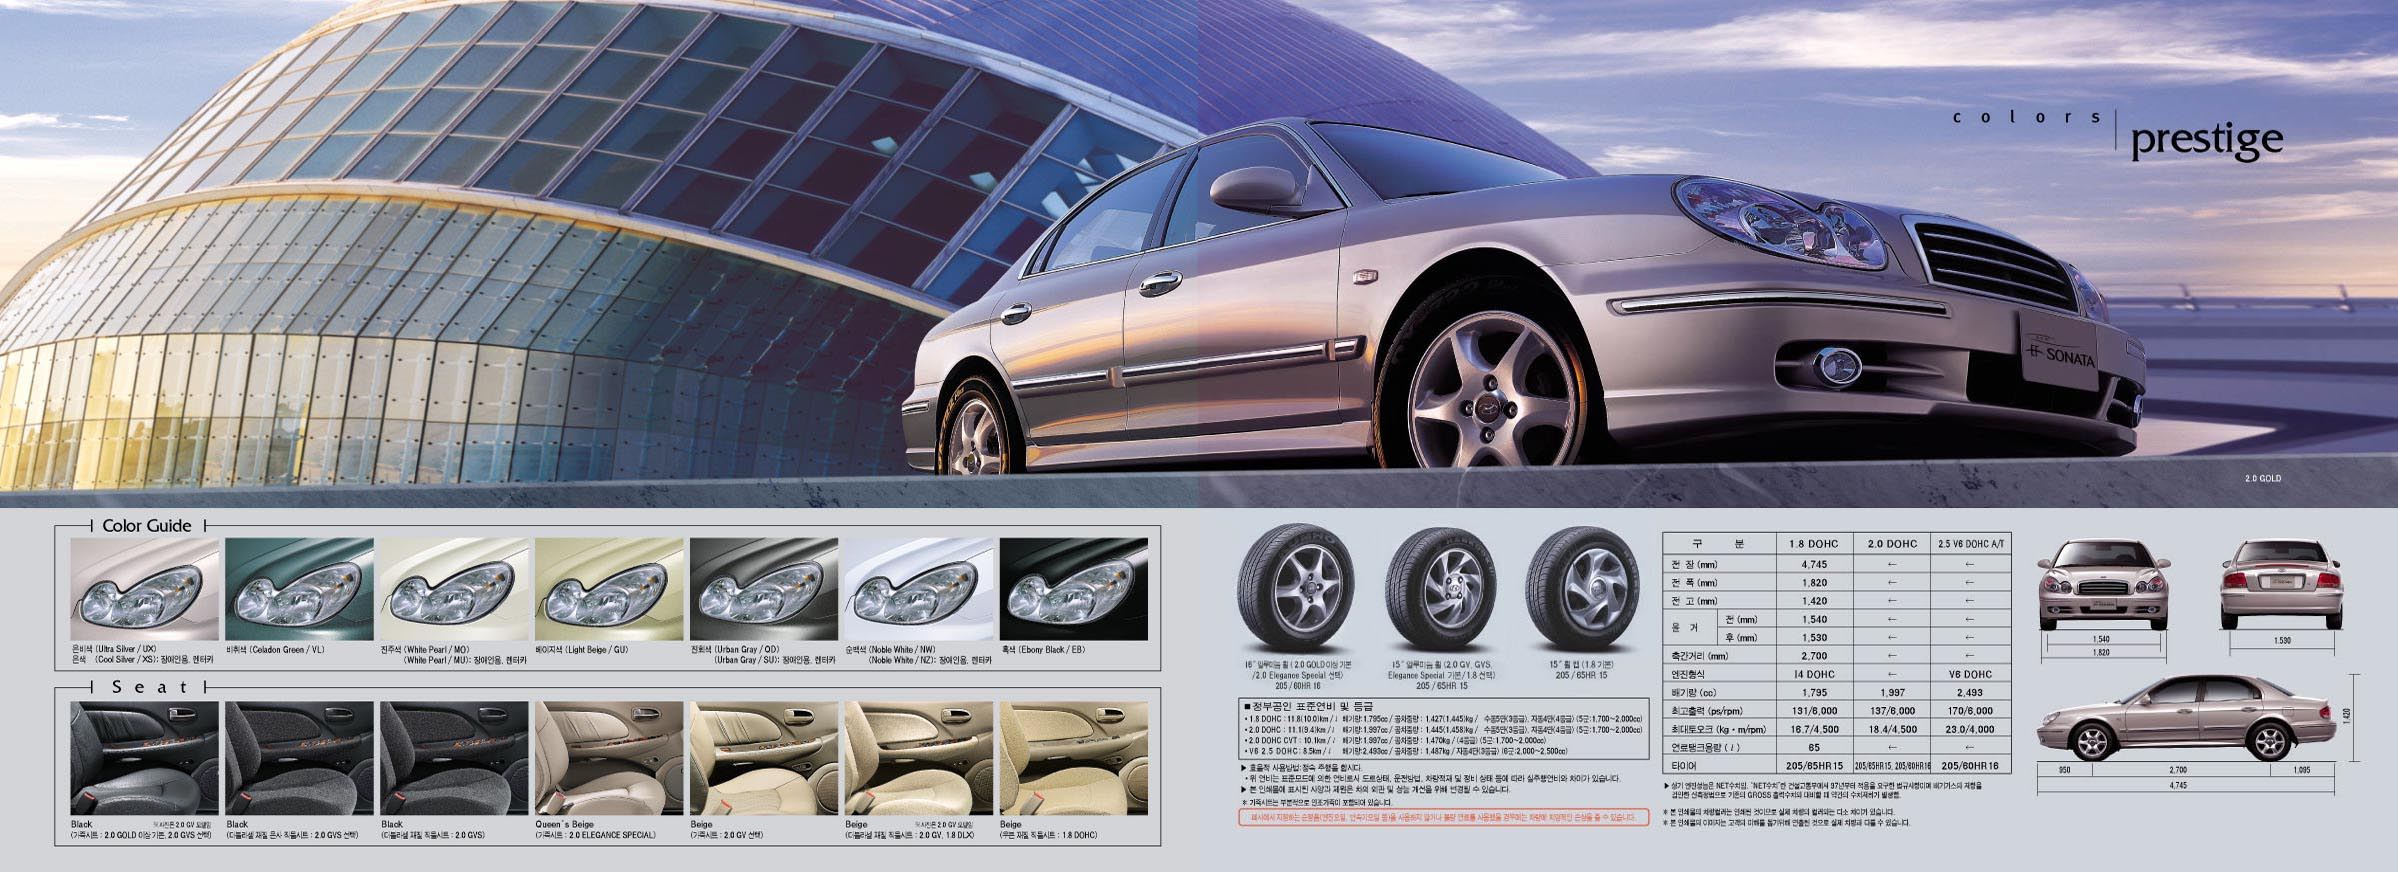 newEFsonata_catalog-030 copy.jpg